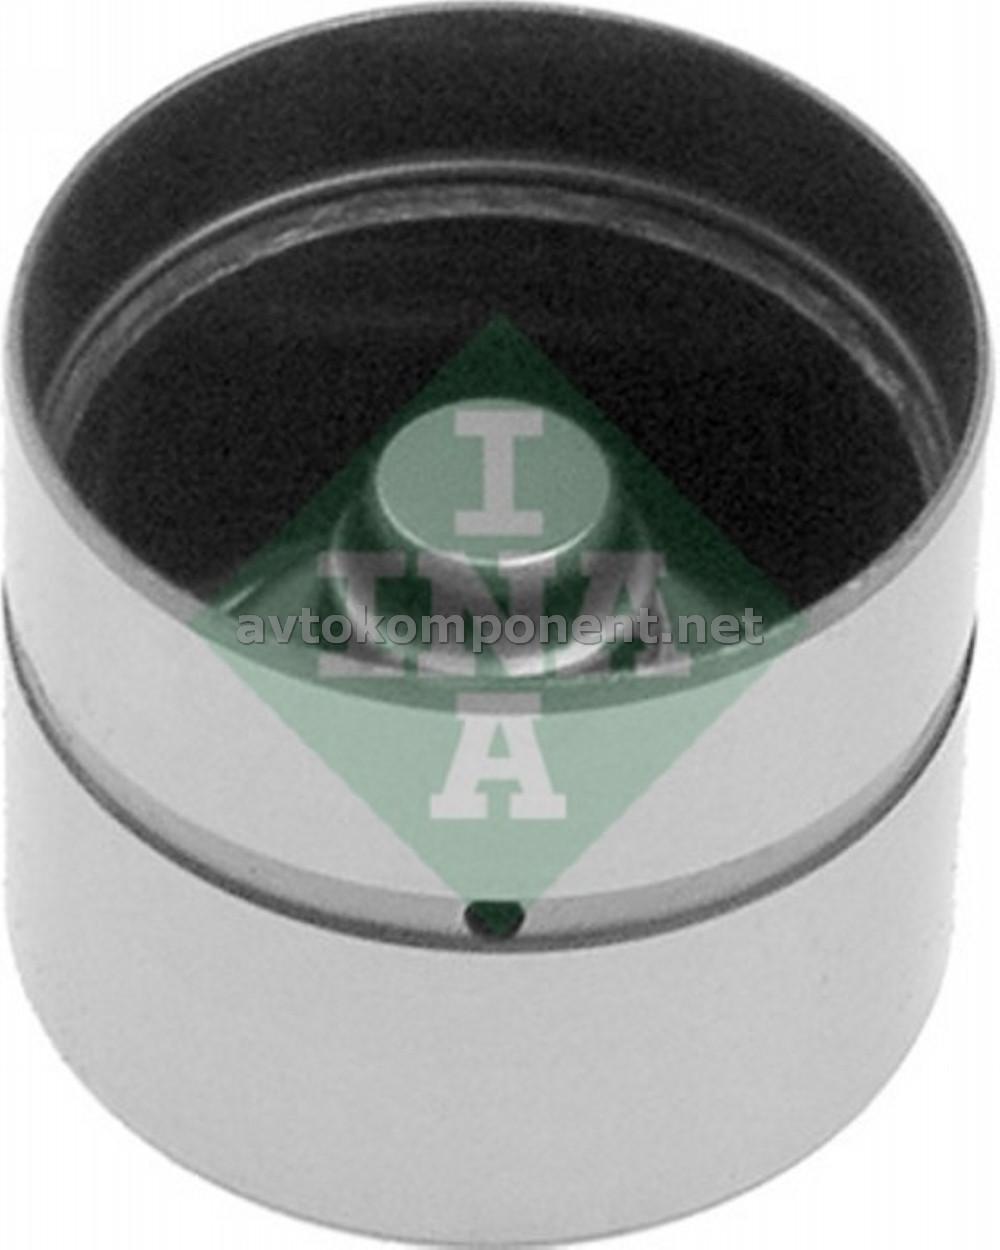 Гидротолкатель DAEWOO/CHEVROLET/OPEL Lanos/Aveo 1.6 16V/2.0 16V (производство Ina) (арт. 420 0059 10), ABHZX